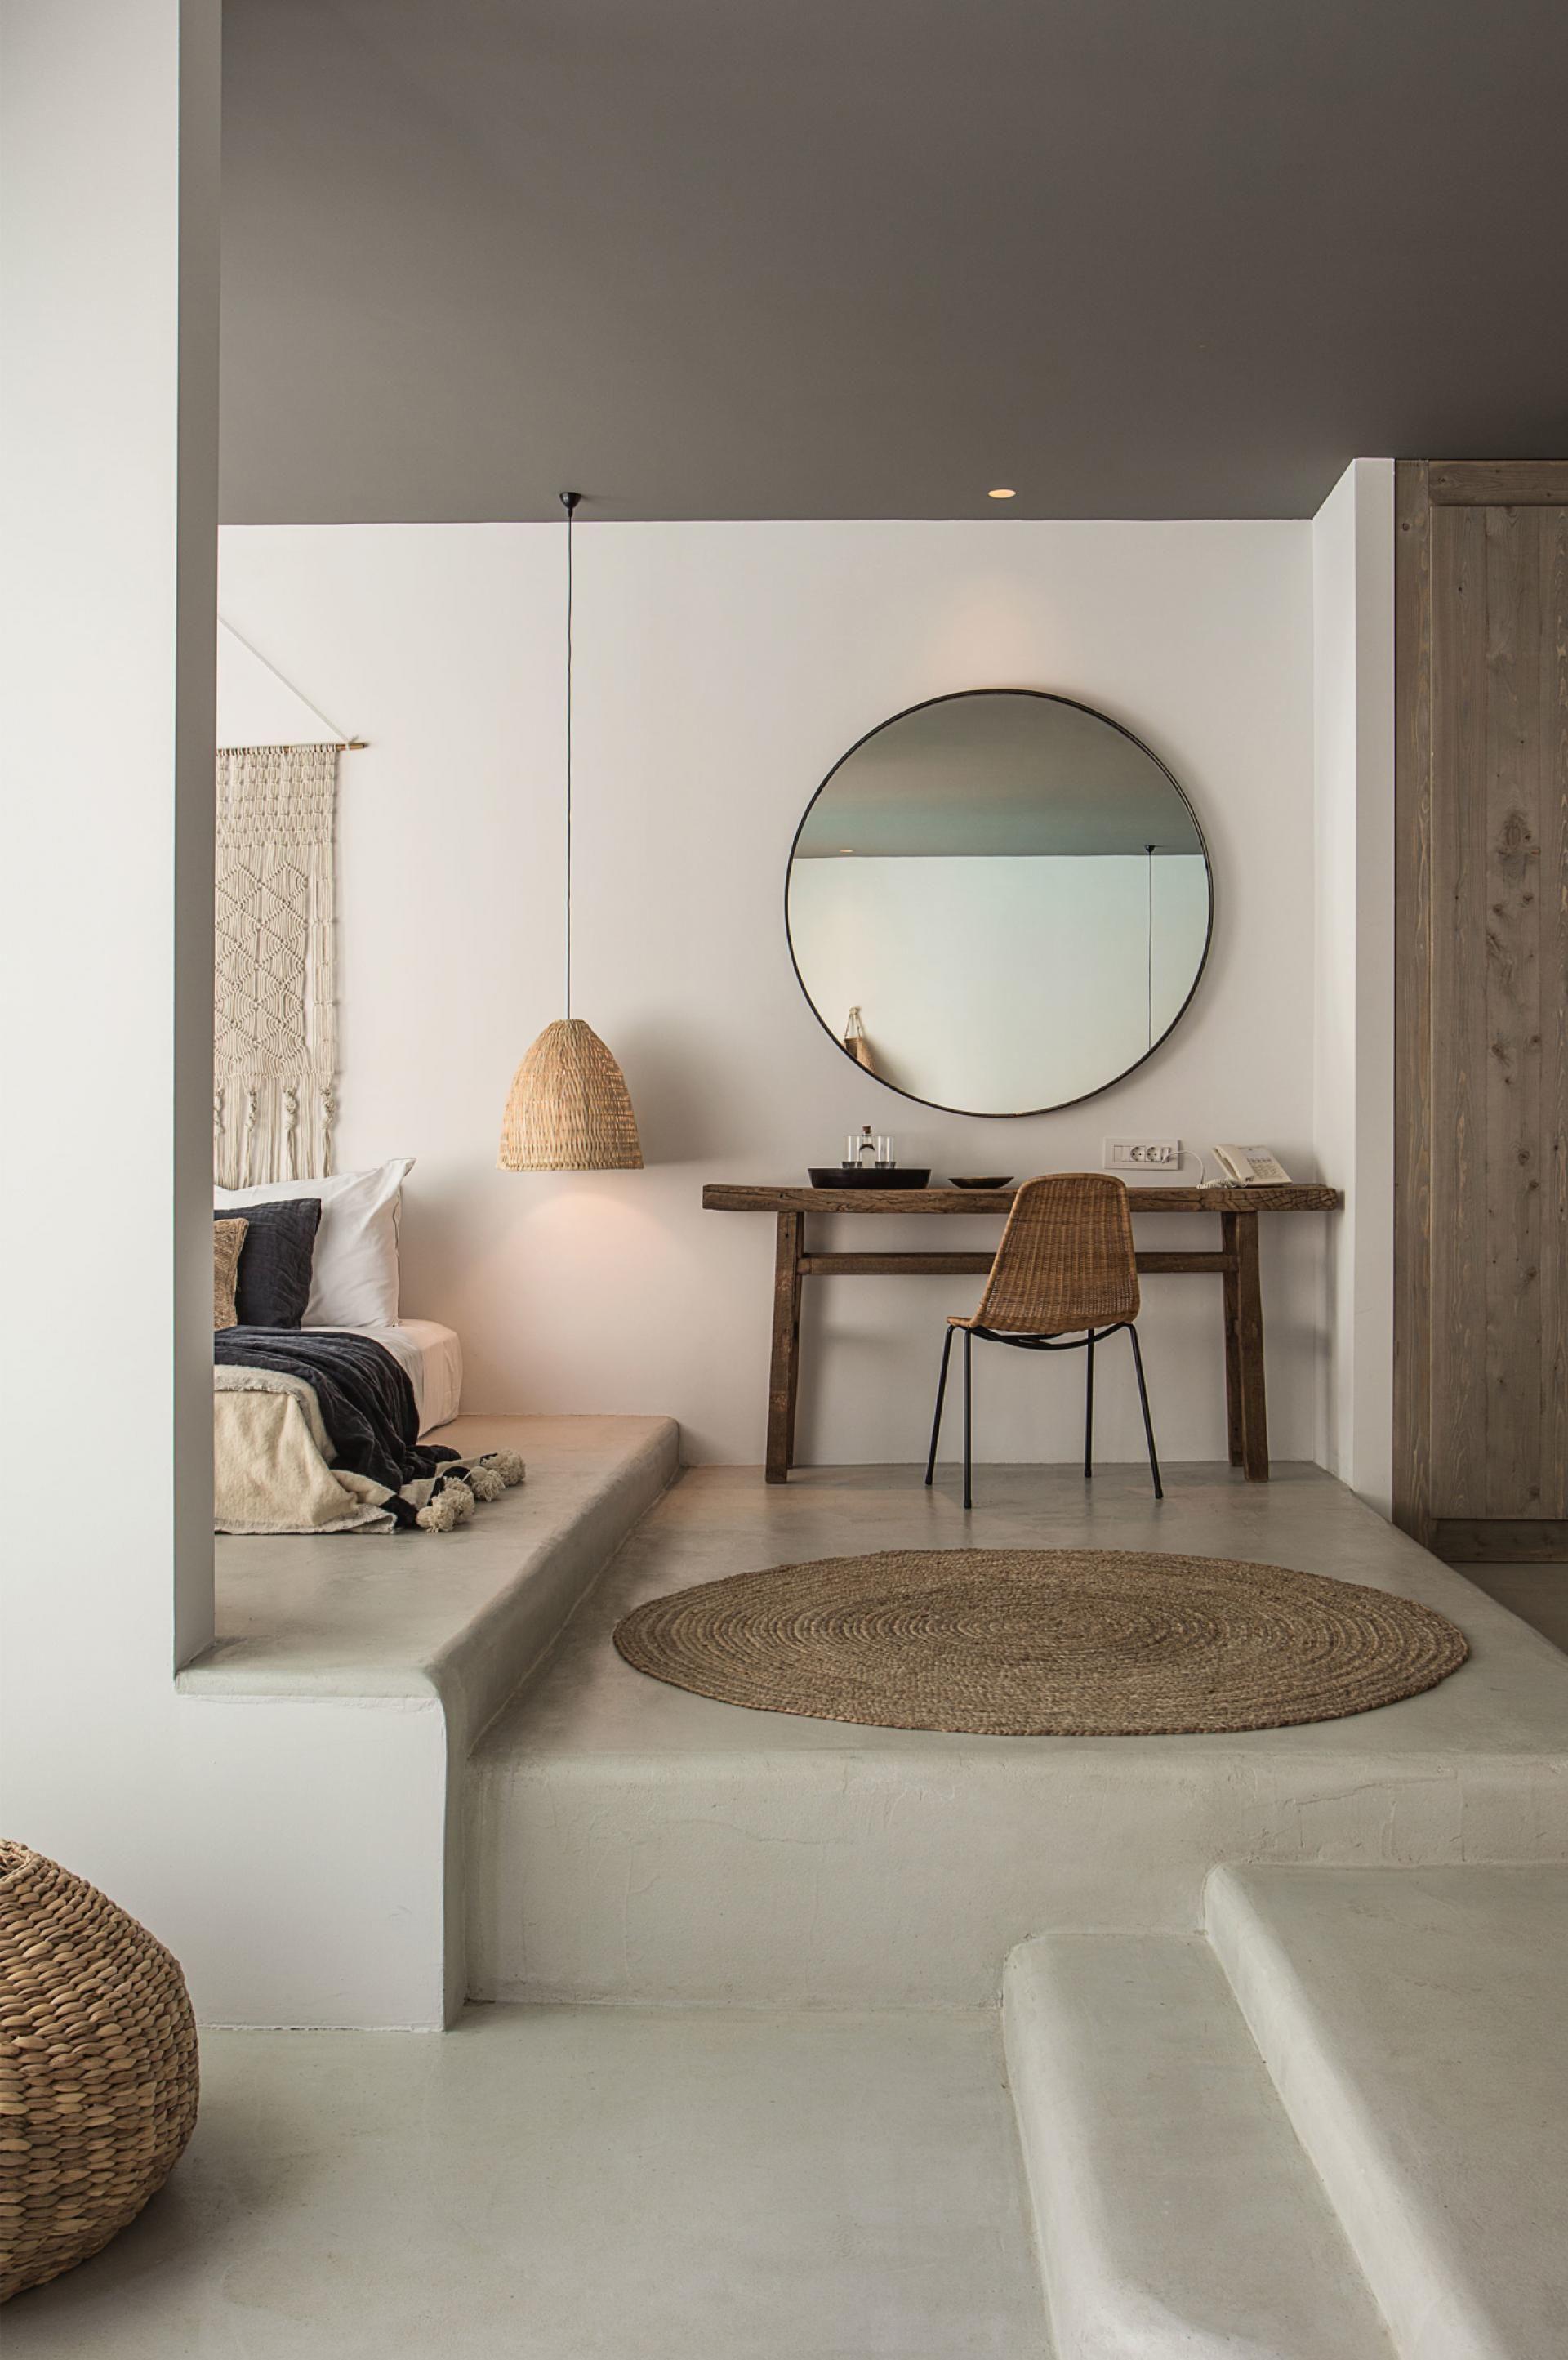 Round jute rug Home decor bedroom, Minimalist home